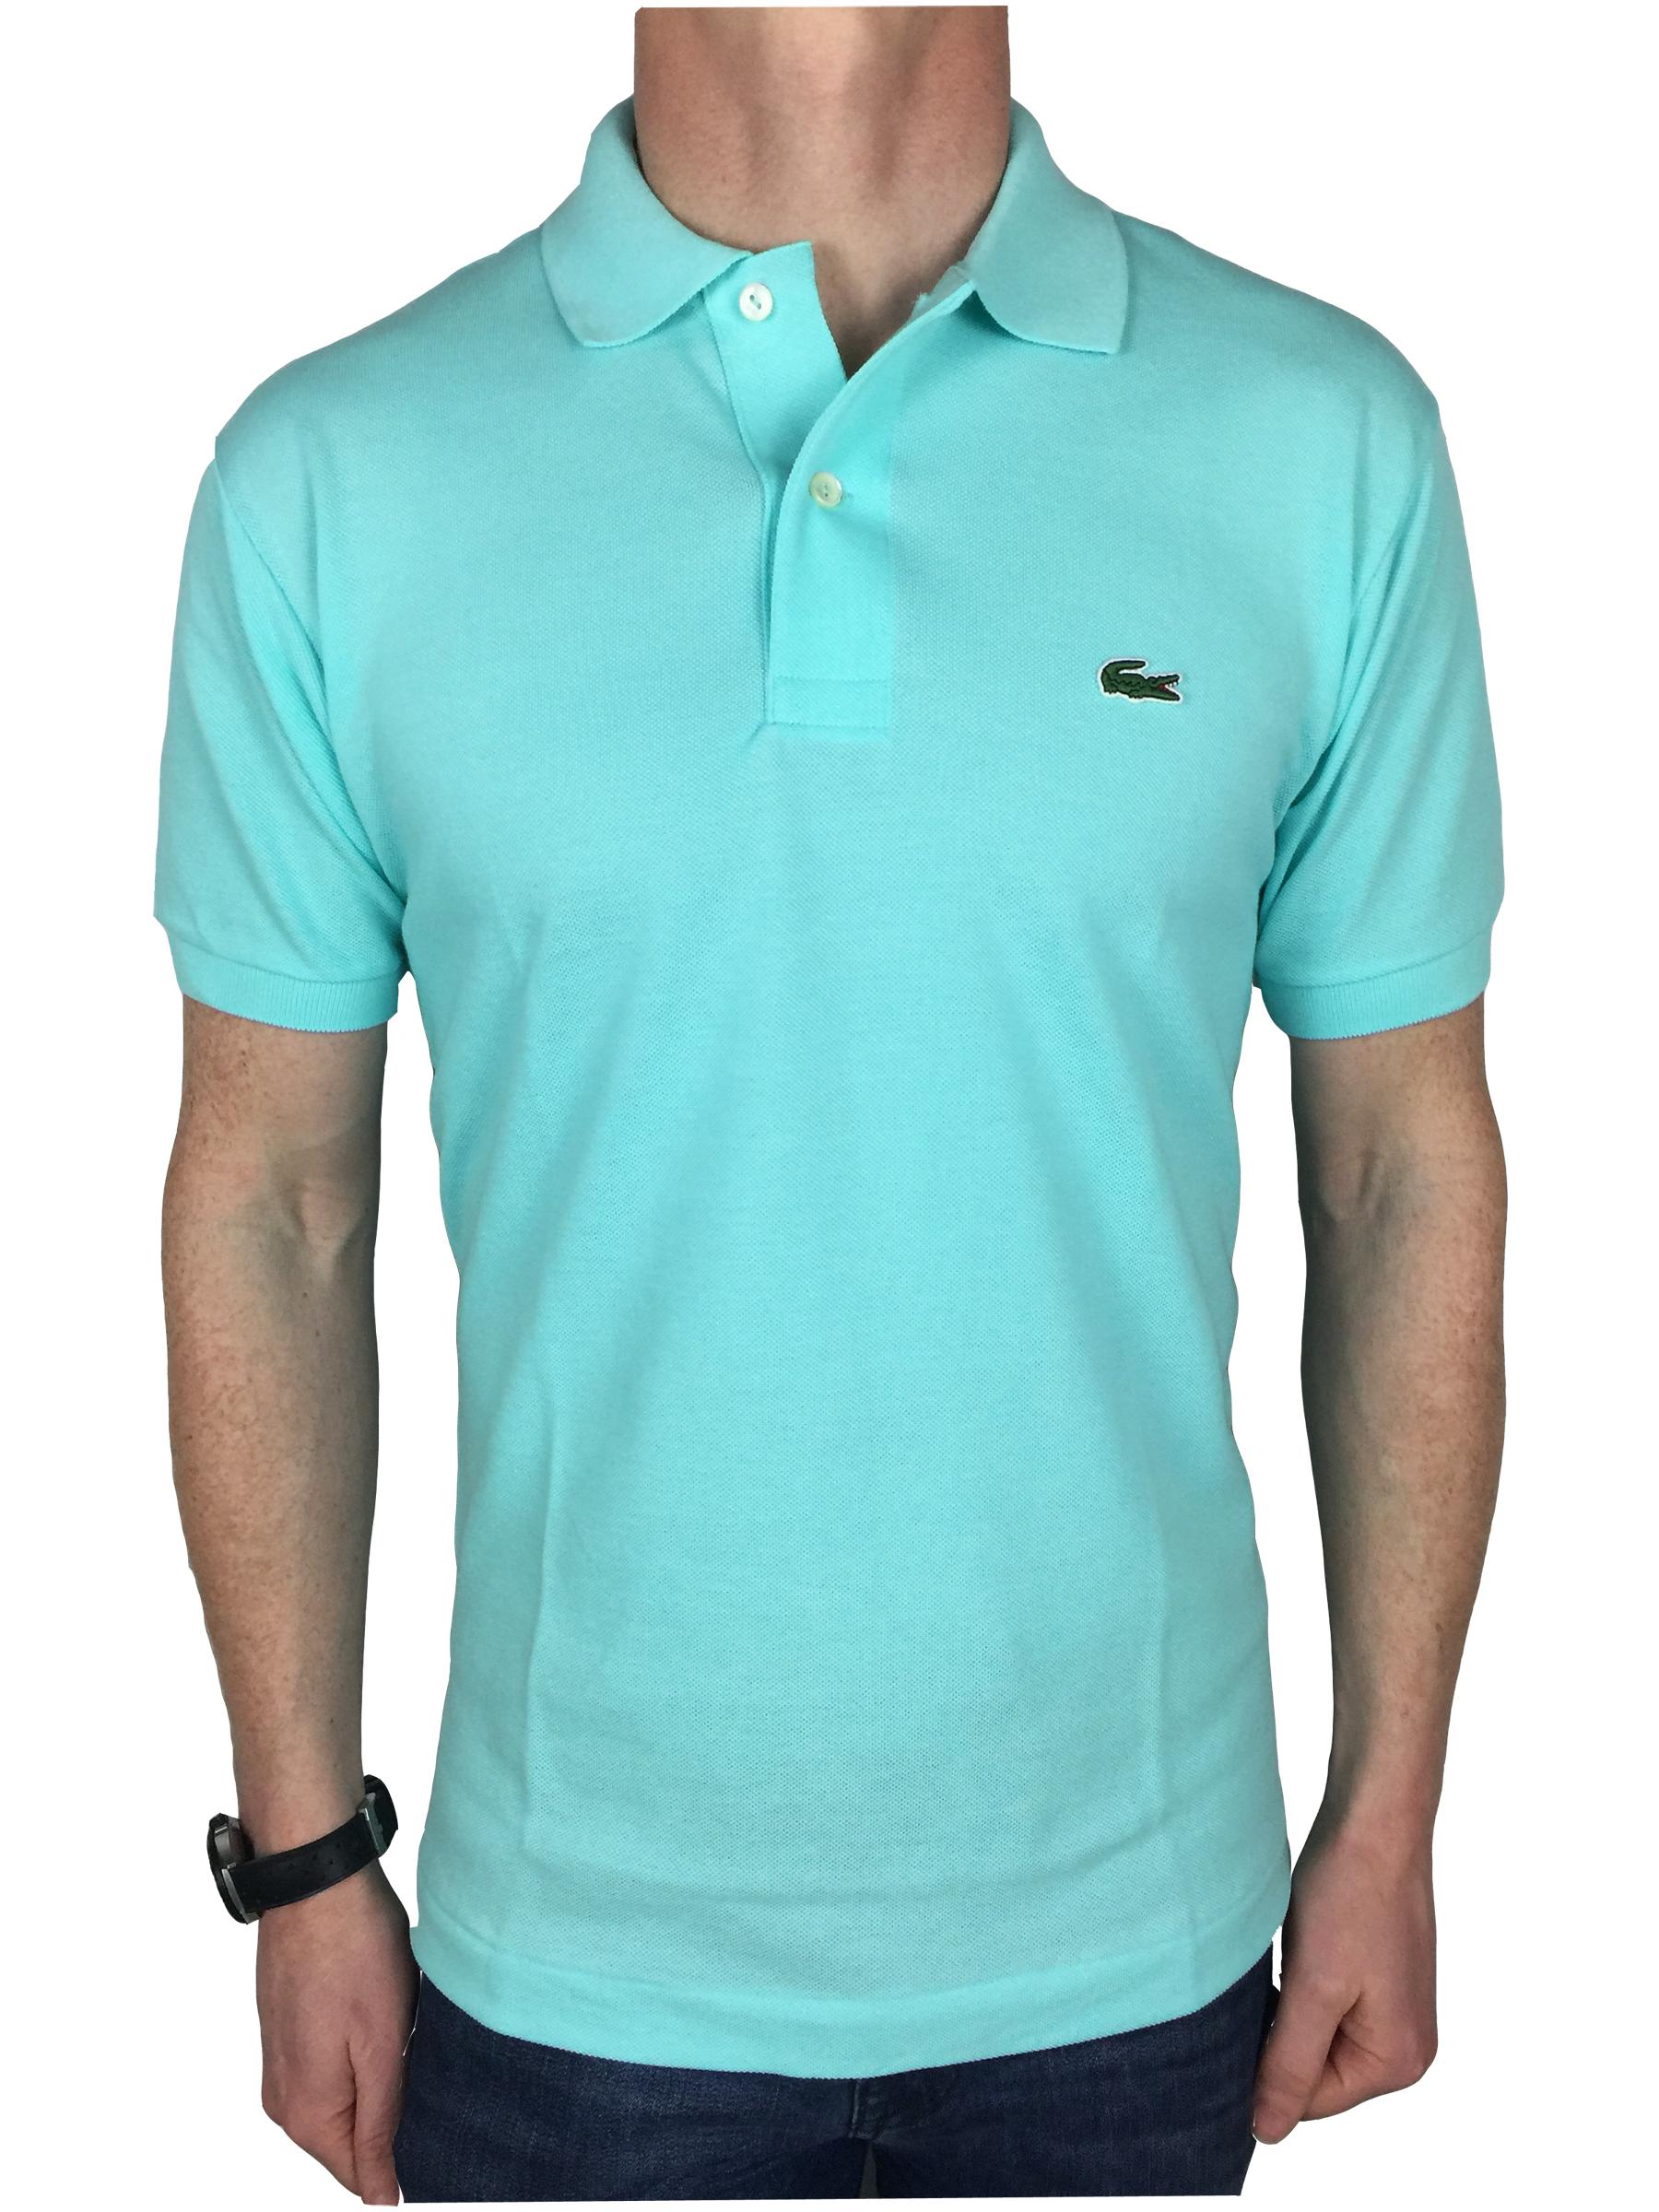 Lacoste mens s s logo branded polo shirt in eden green ebay for Lacoste polo shirts ebay